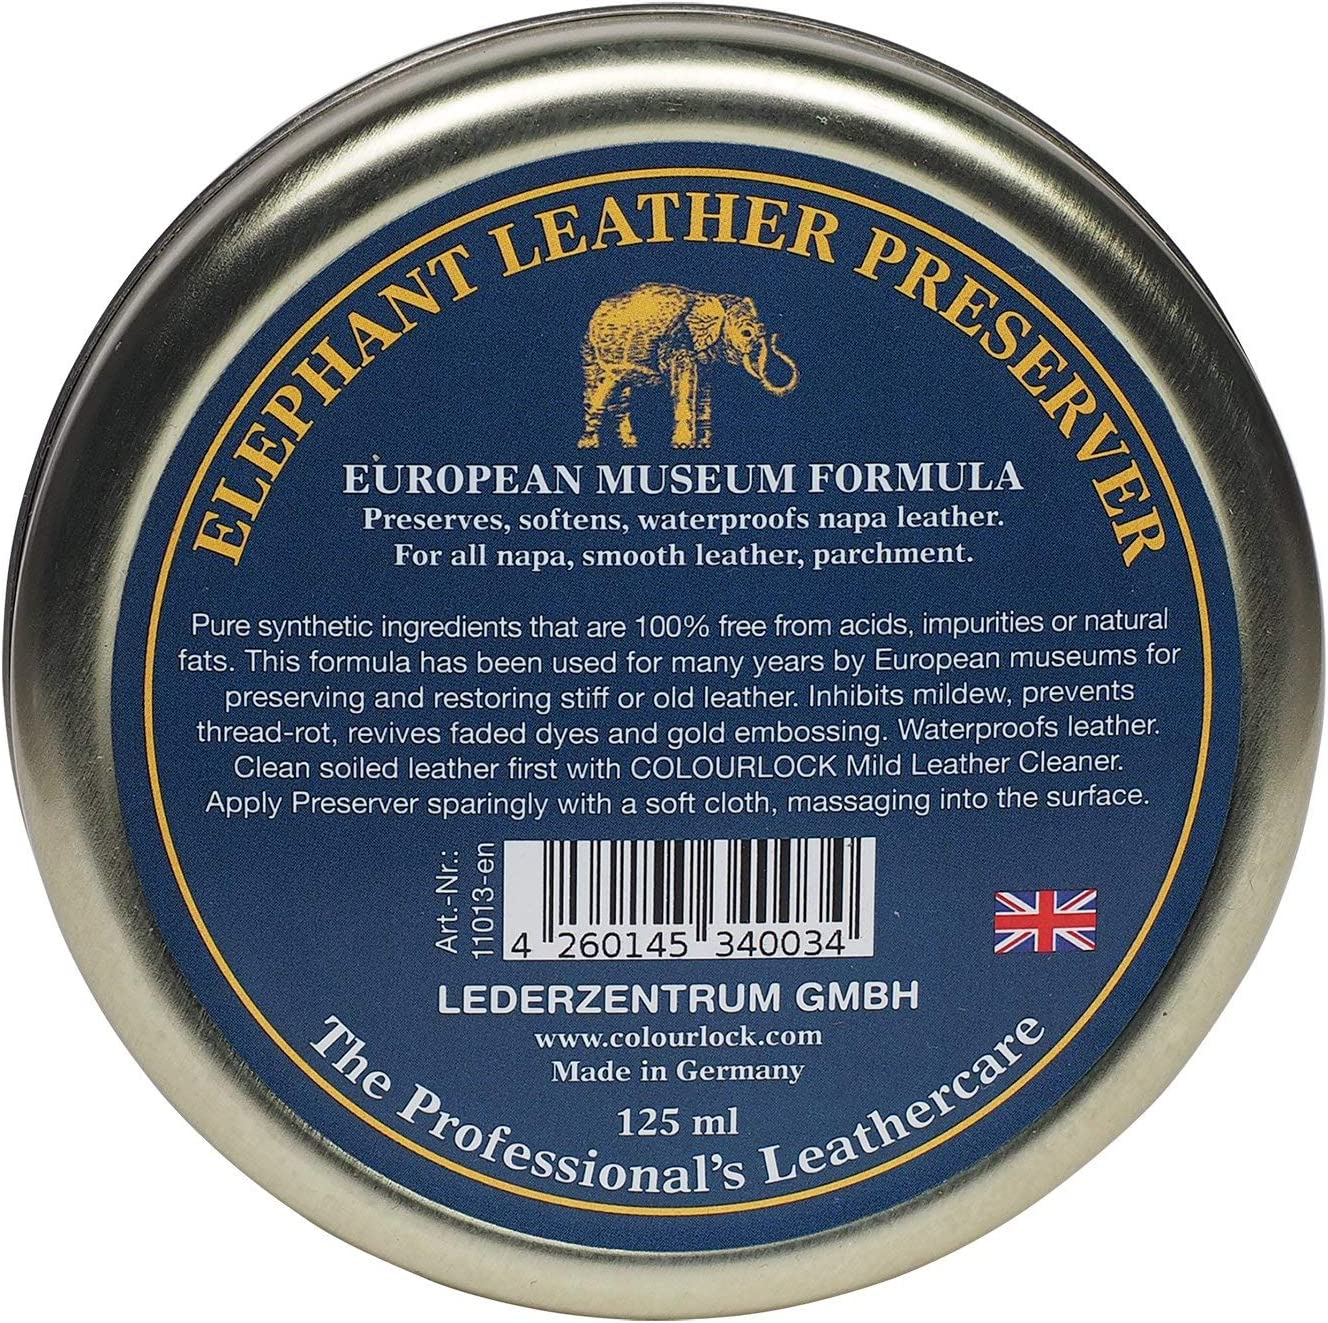 Colourlock Elephant Leather Preserve Wax To Restore Care Nourish And Waterproof Leather Car Interior Handbags Chesterfield Sofas Etc 125 Ml Automotive